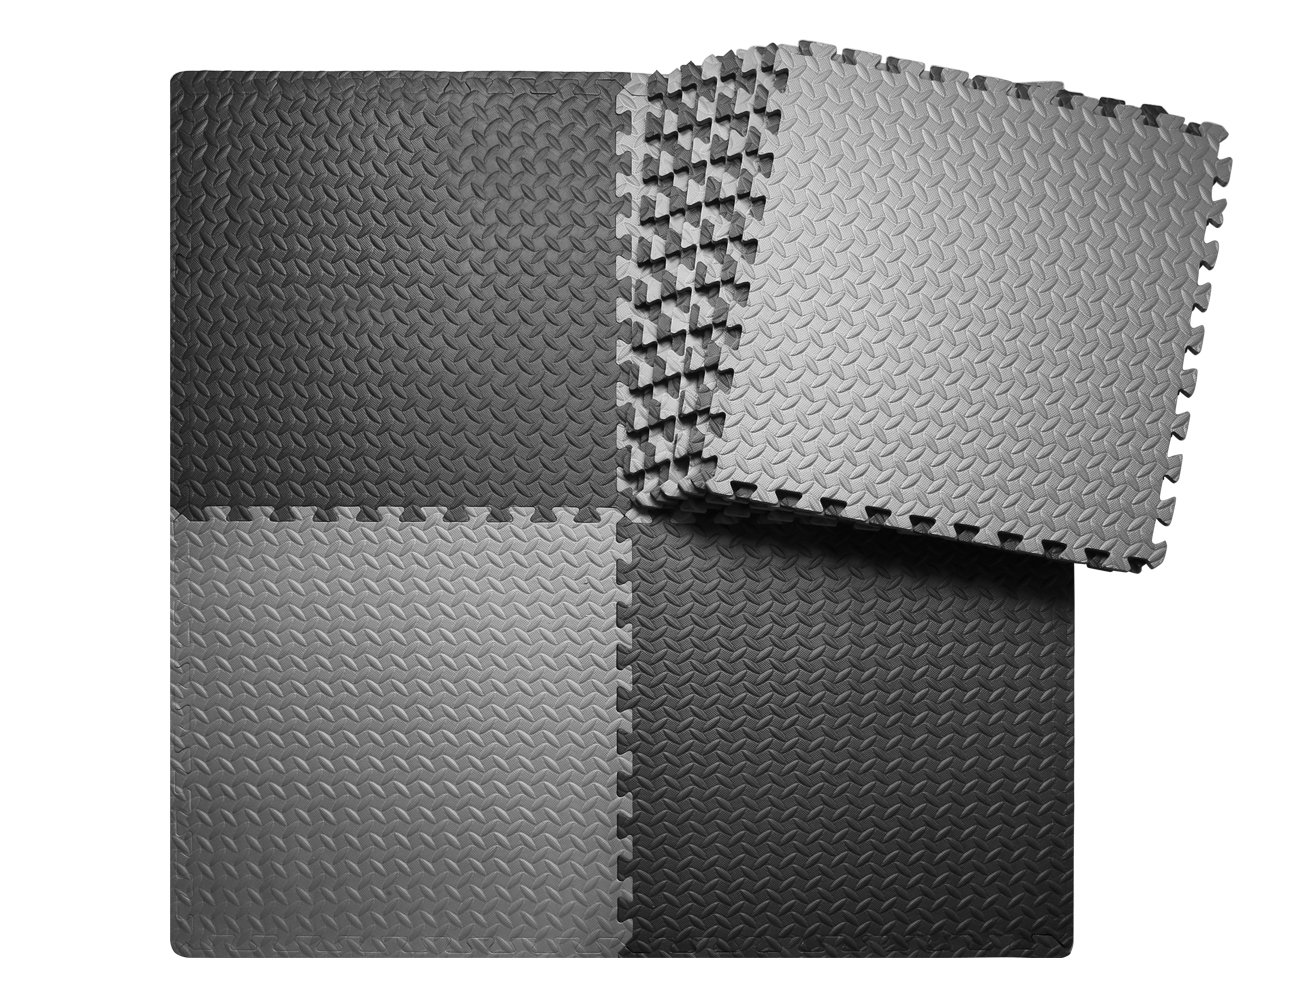 innhom 12 Tiles, 46 SQ. FT Gym Mat Exercise Mat Puzzle Foam Mats Gym Flooring Mat Interlocking Foam Mats with EVA Foam Floor Tiles for Gym Equipment Workout Mat, Black and Gray by innhom